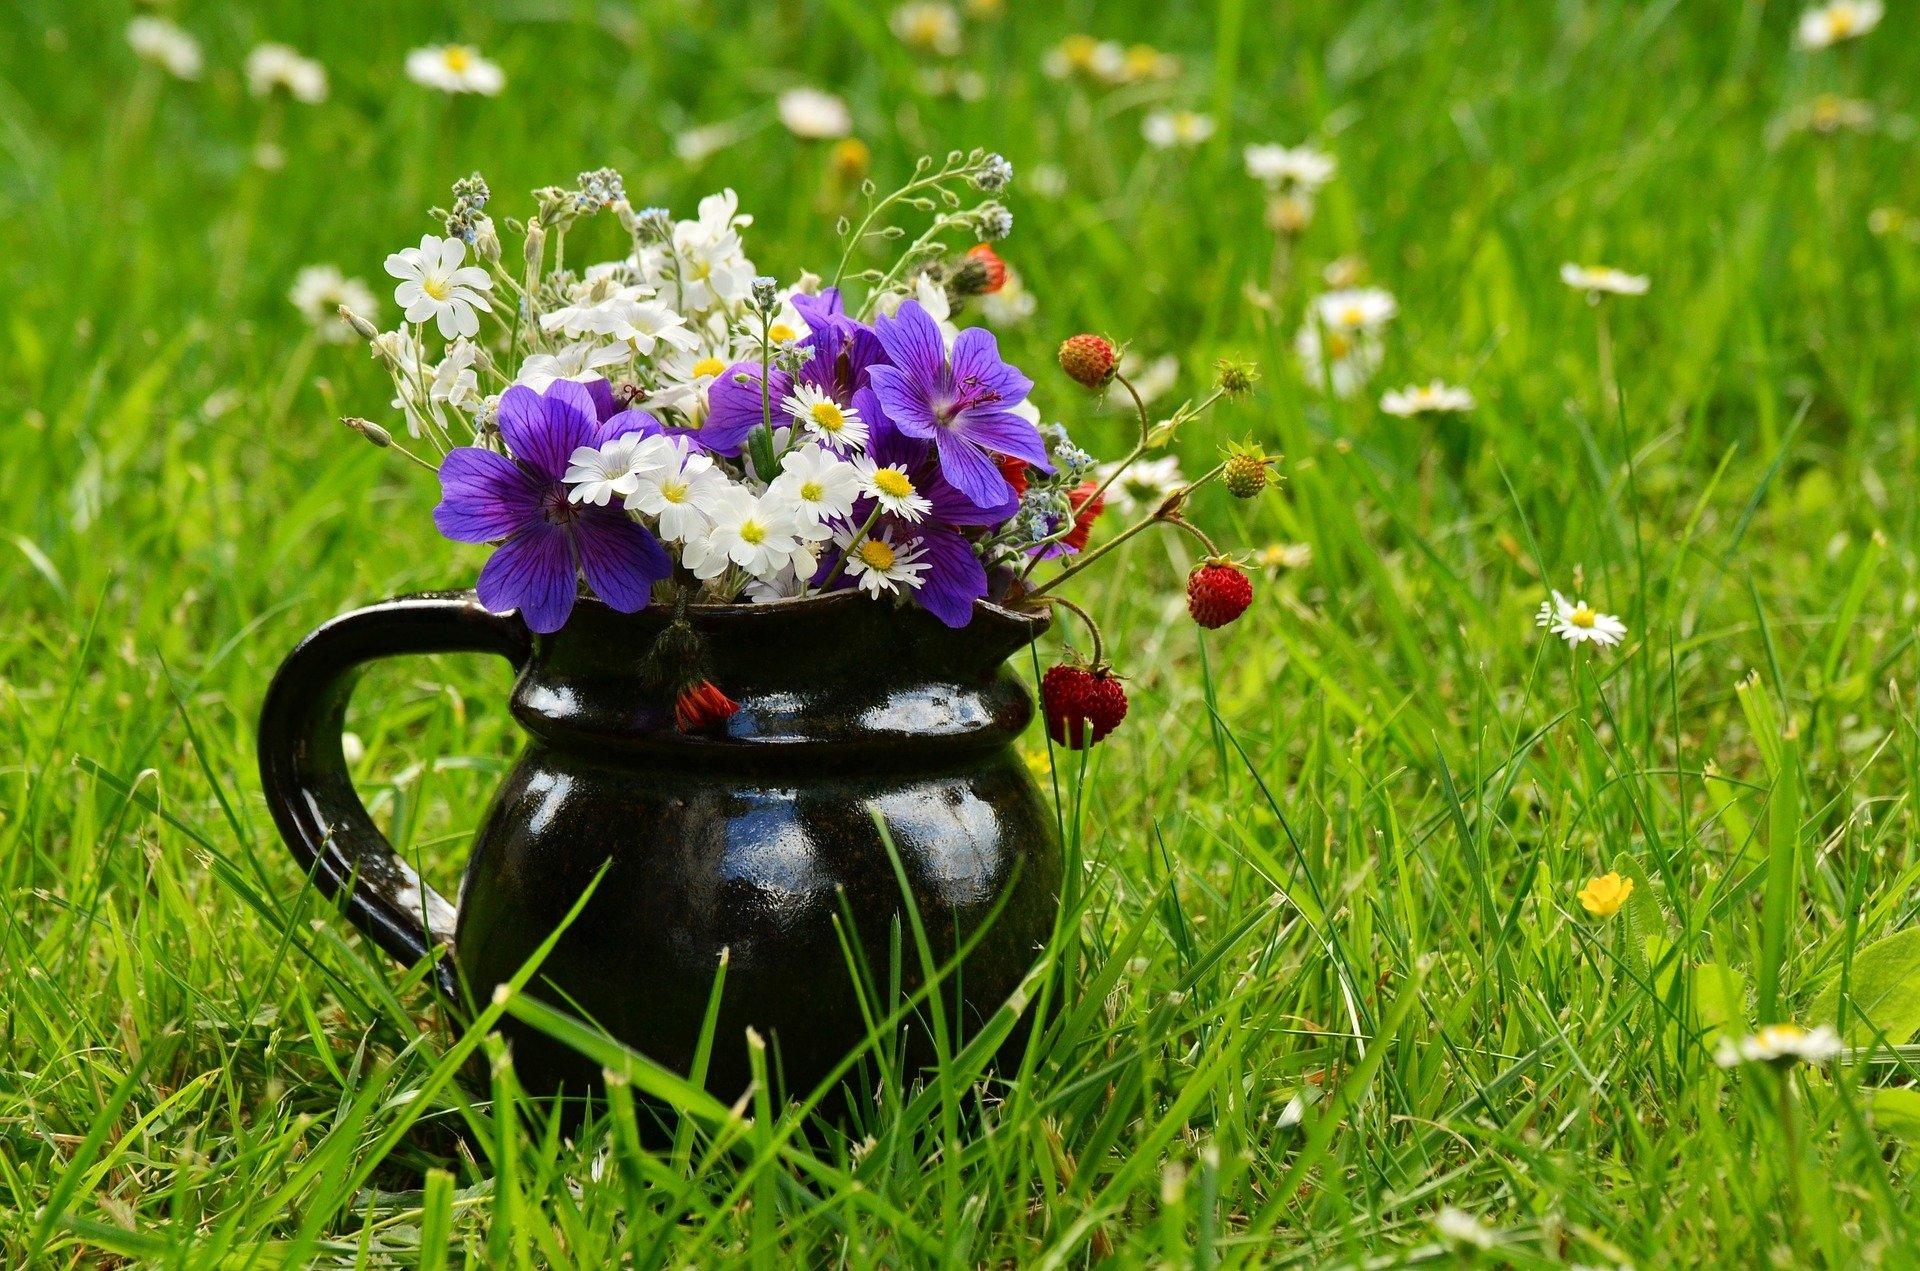 lato wazon łaka kwiaty pixabay